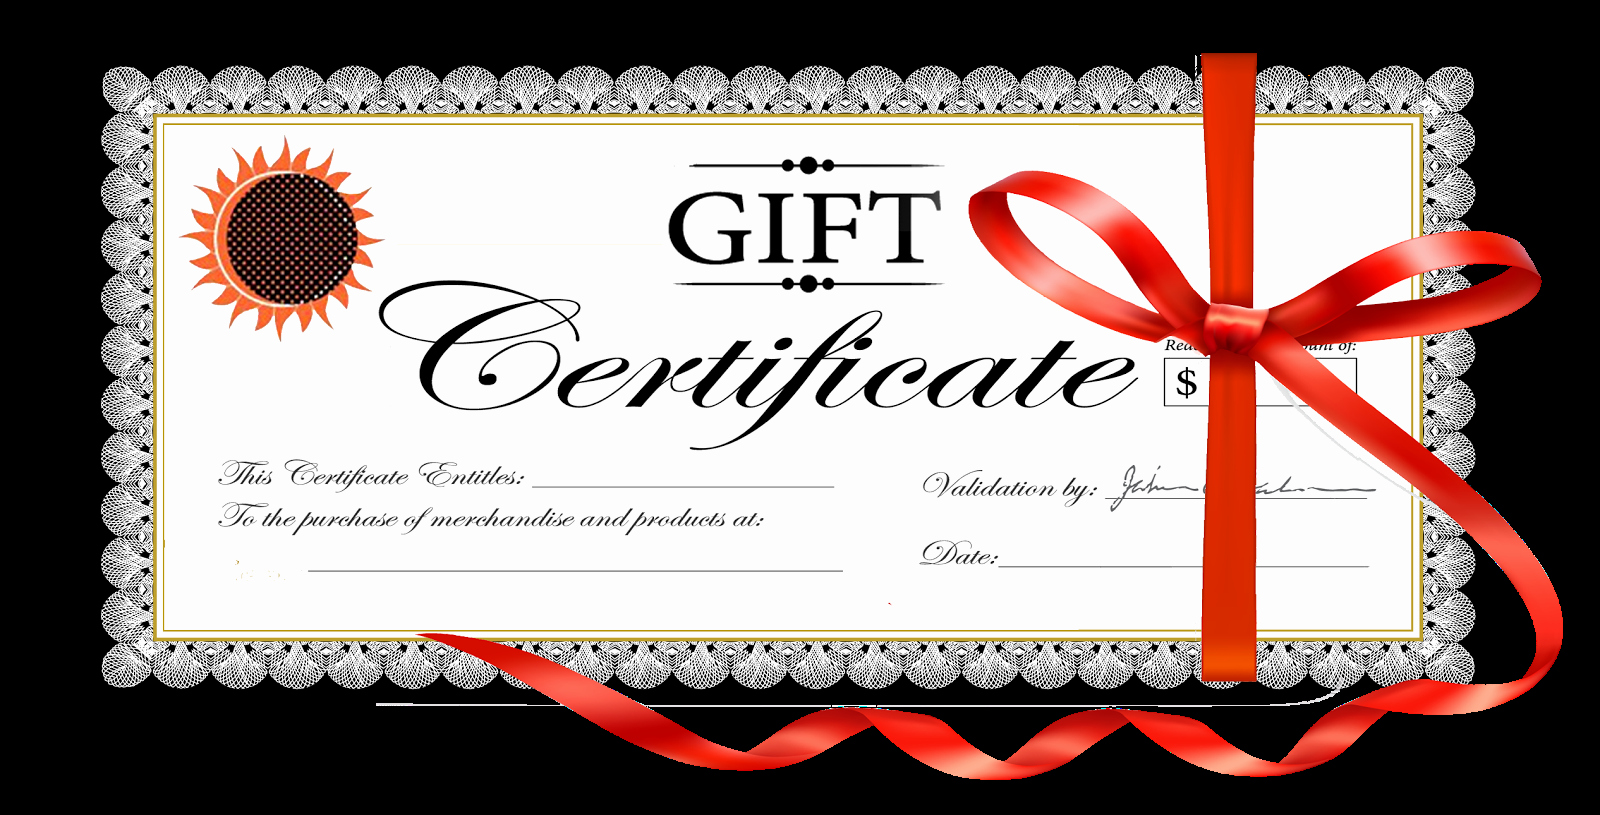 Word Templates for Gift Certificates Elegant 18 Gift Certificate Templates Excel Pdf formats